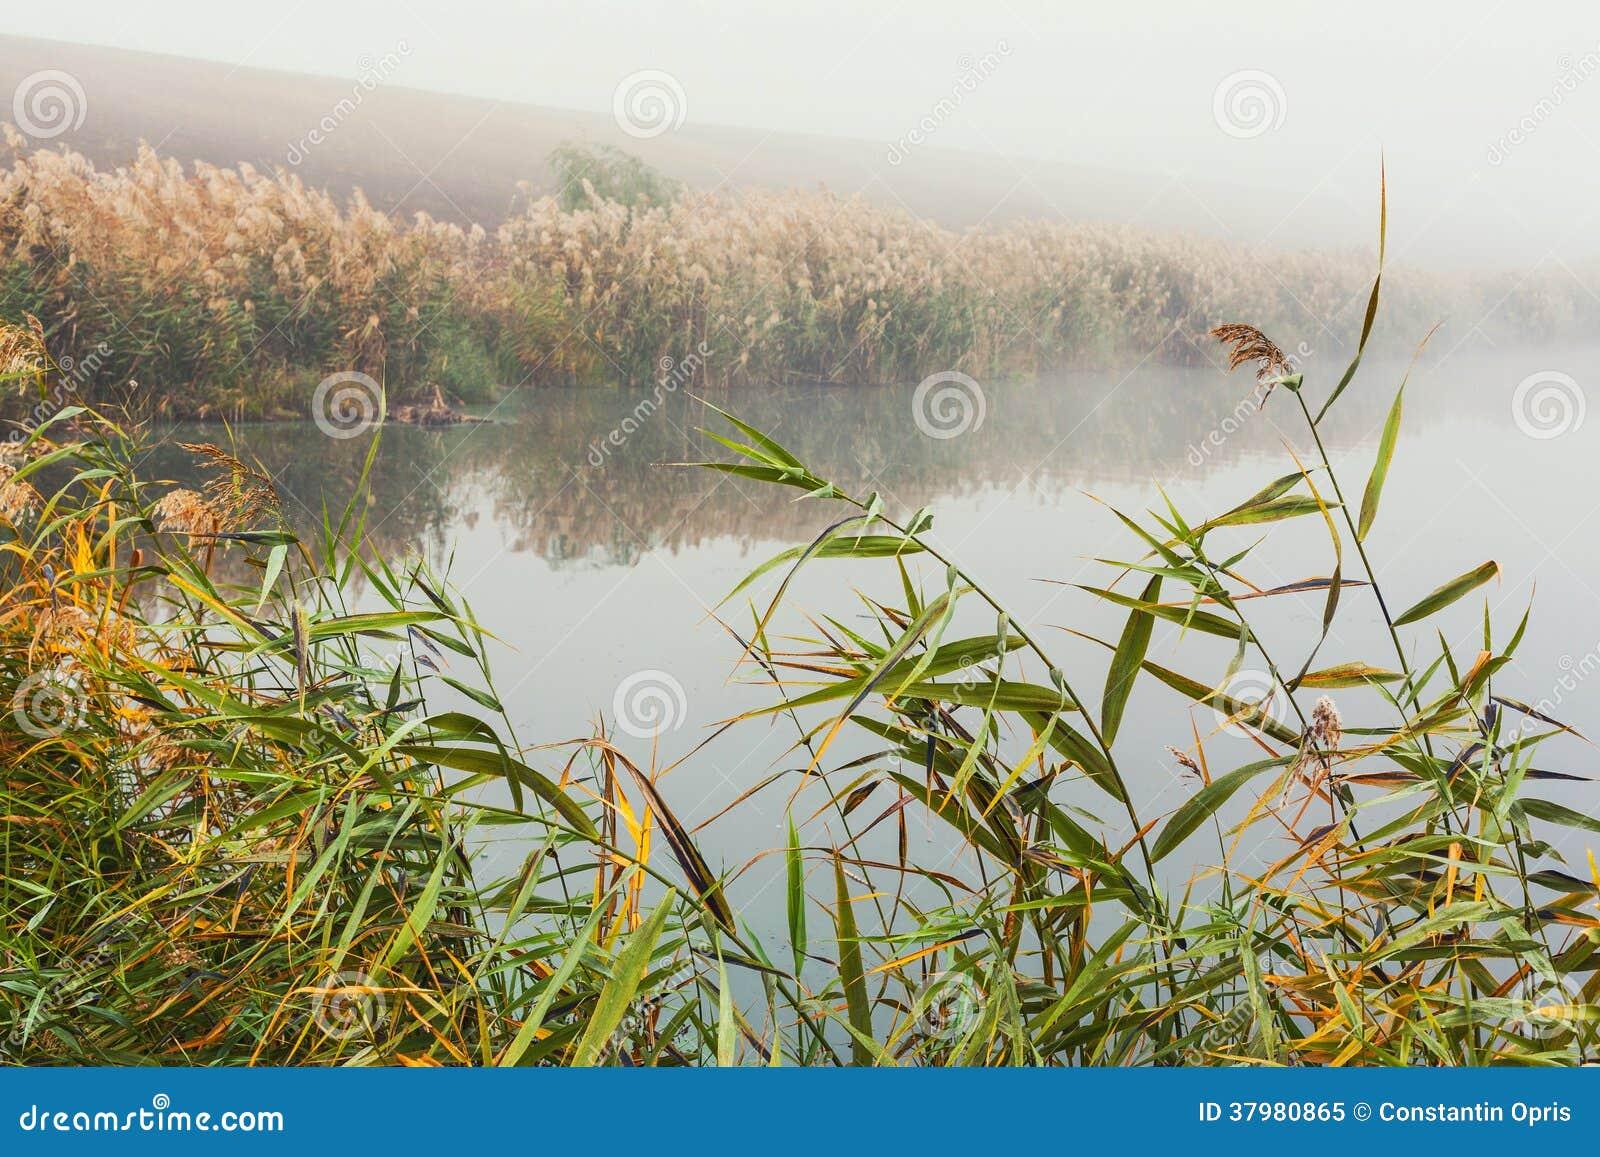 Morning mist on lake royalty free stock photo image for Good fishing days